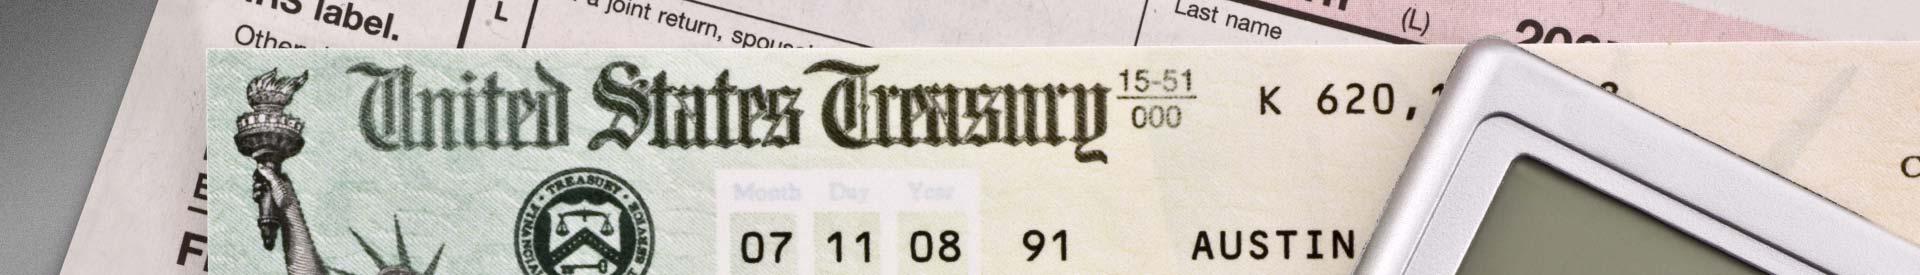 Treasury Check Information System